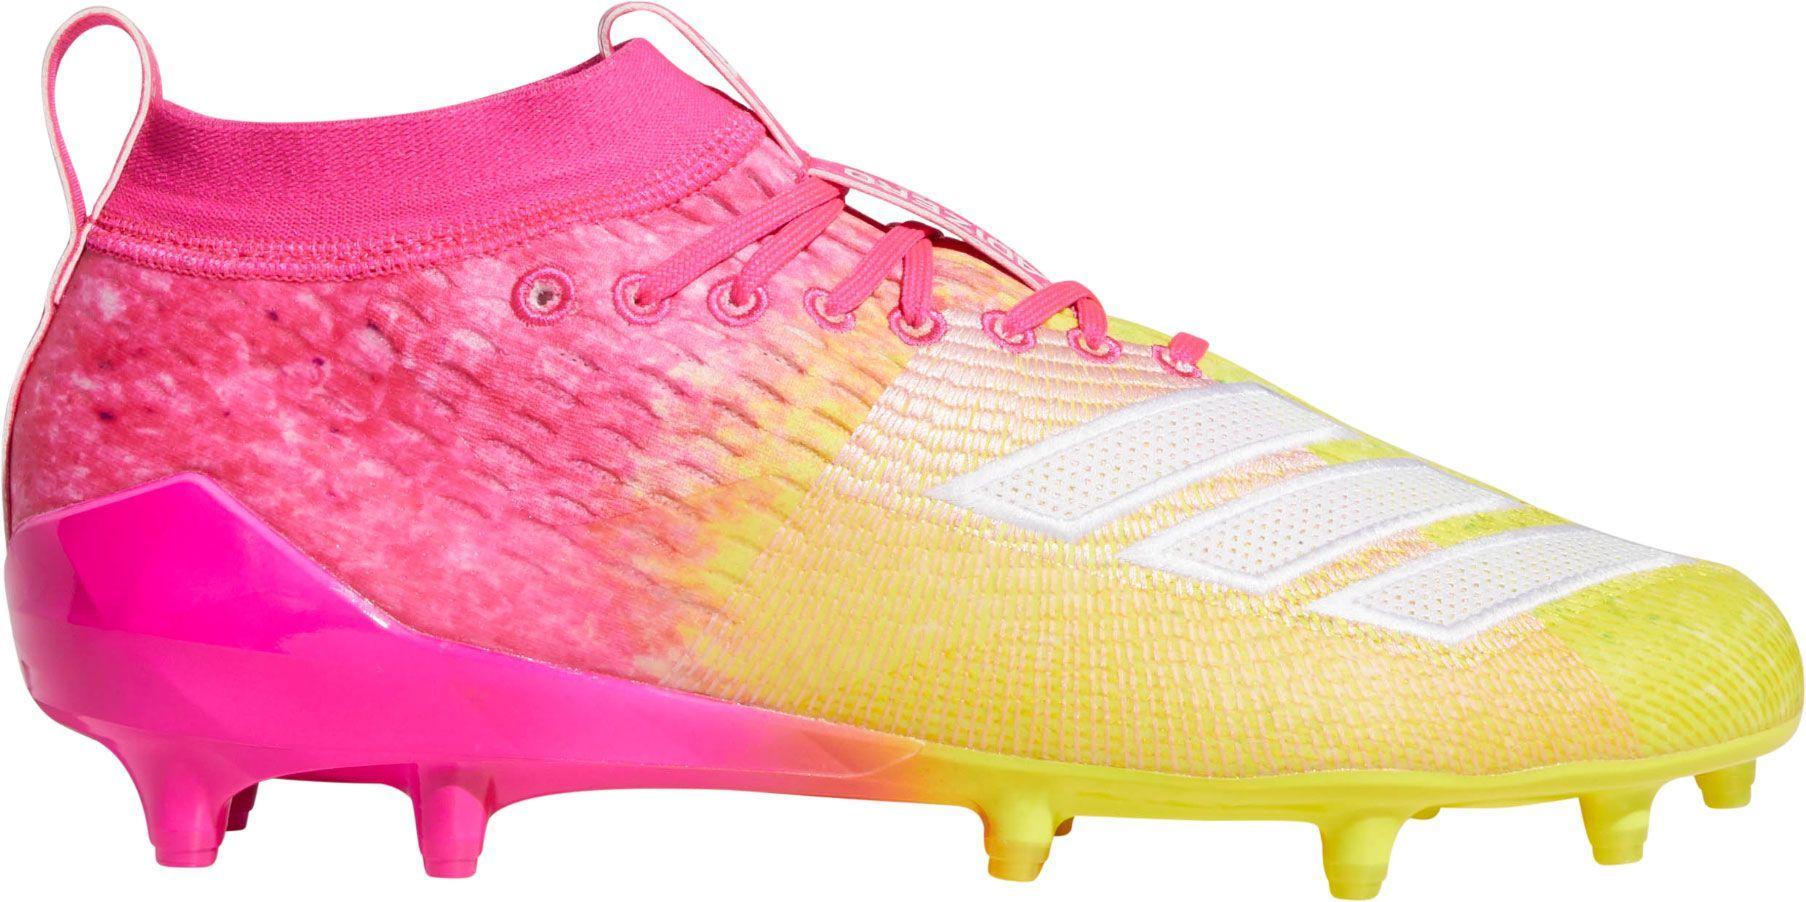 623e719861b5 adidas Men's adizero 8.0 Snow Cone Football Cleats, Size: 16, Pink